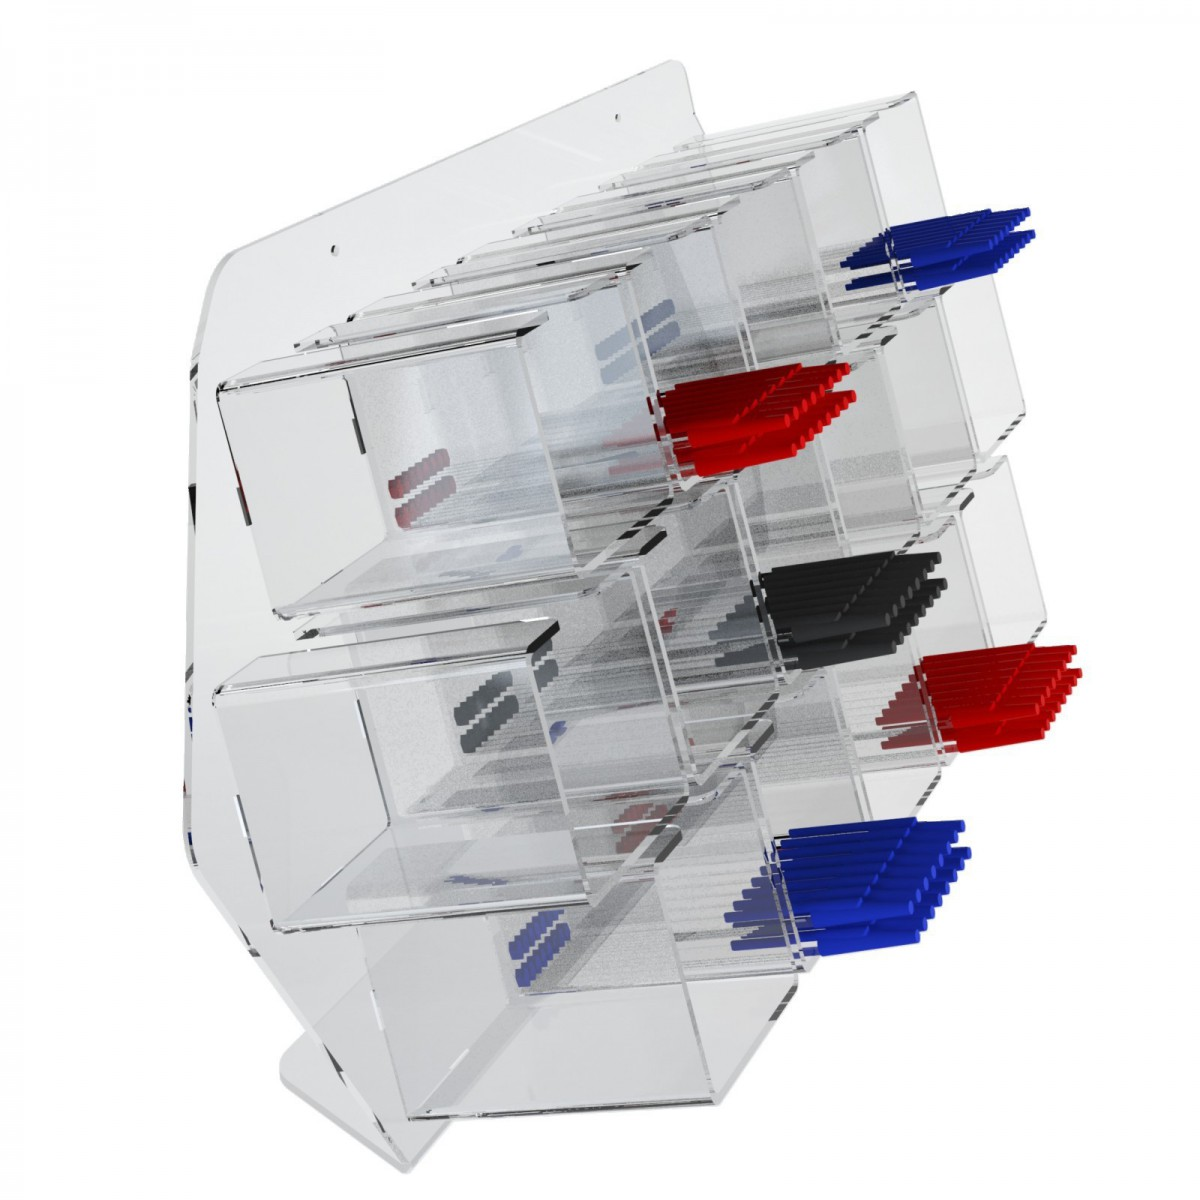 E-413 EPP - Porta penne da parete in plexiglass trasparente a 16 contenitori